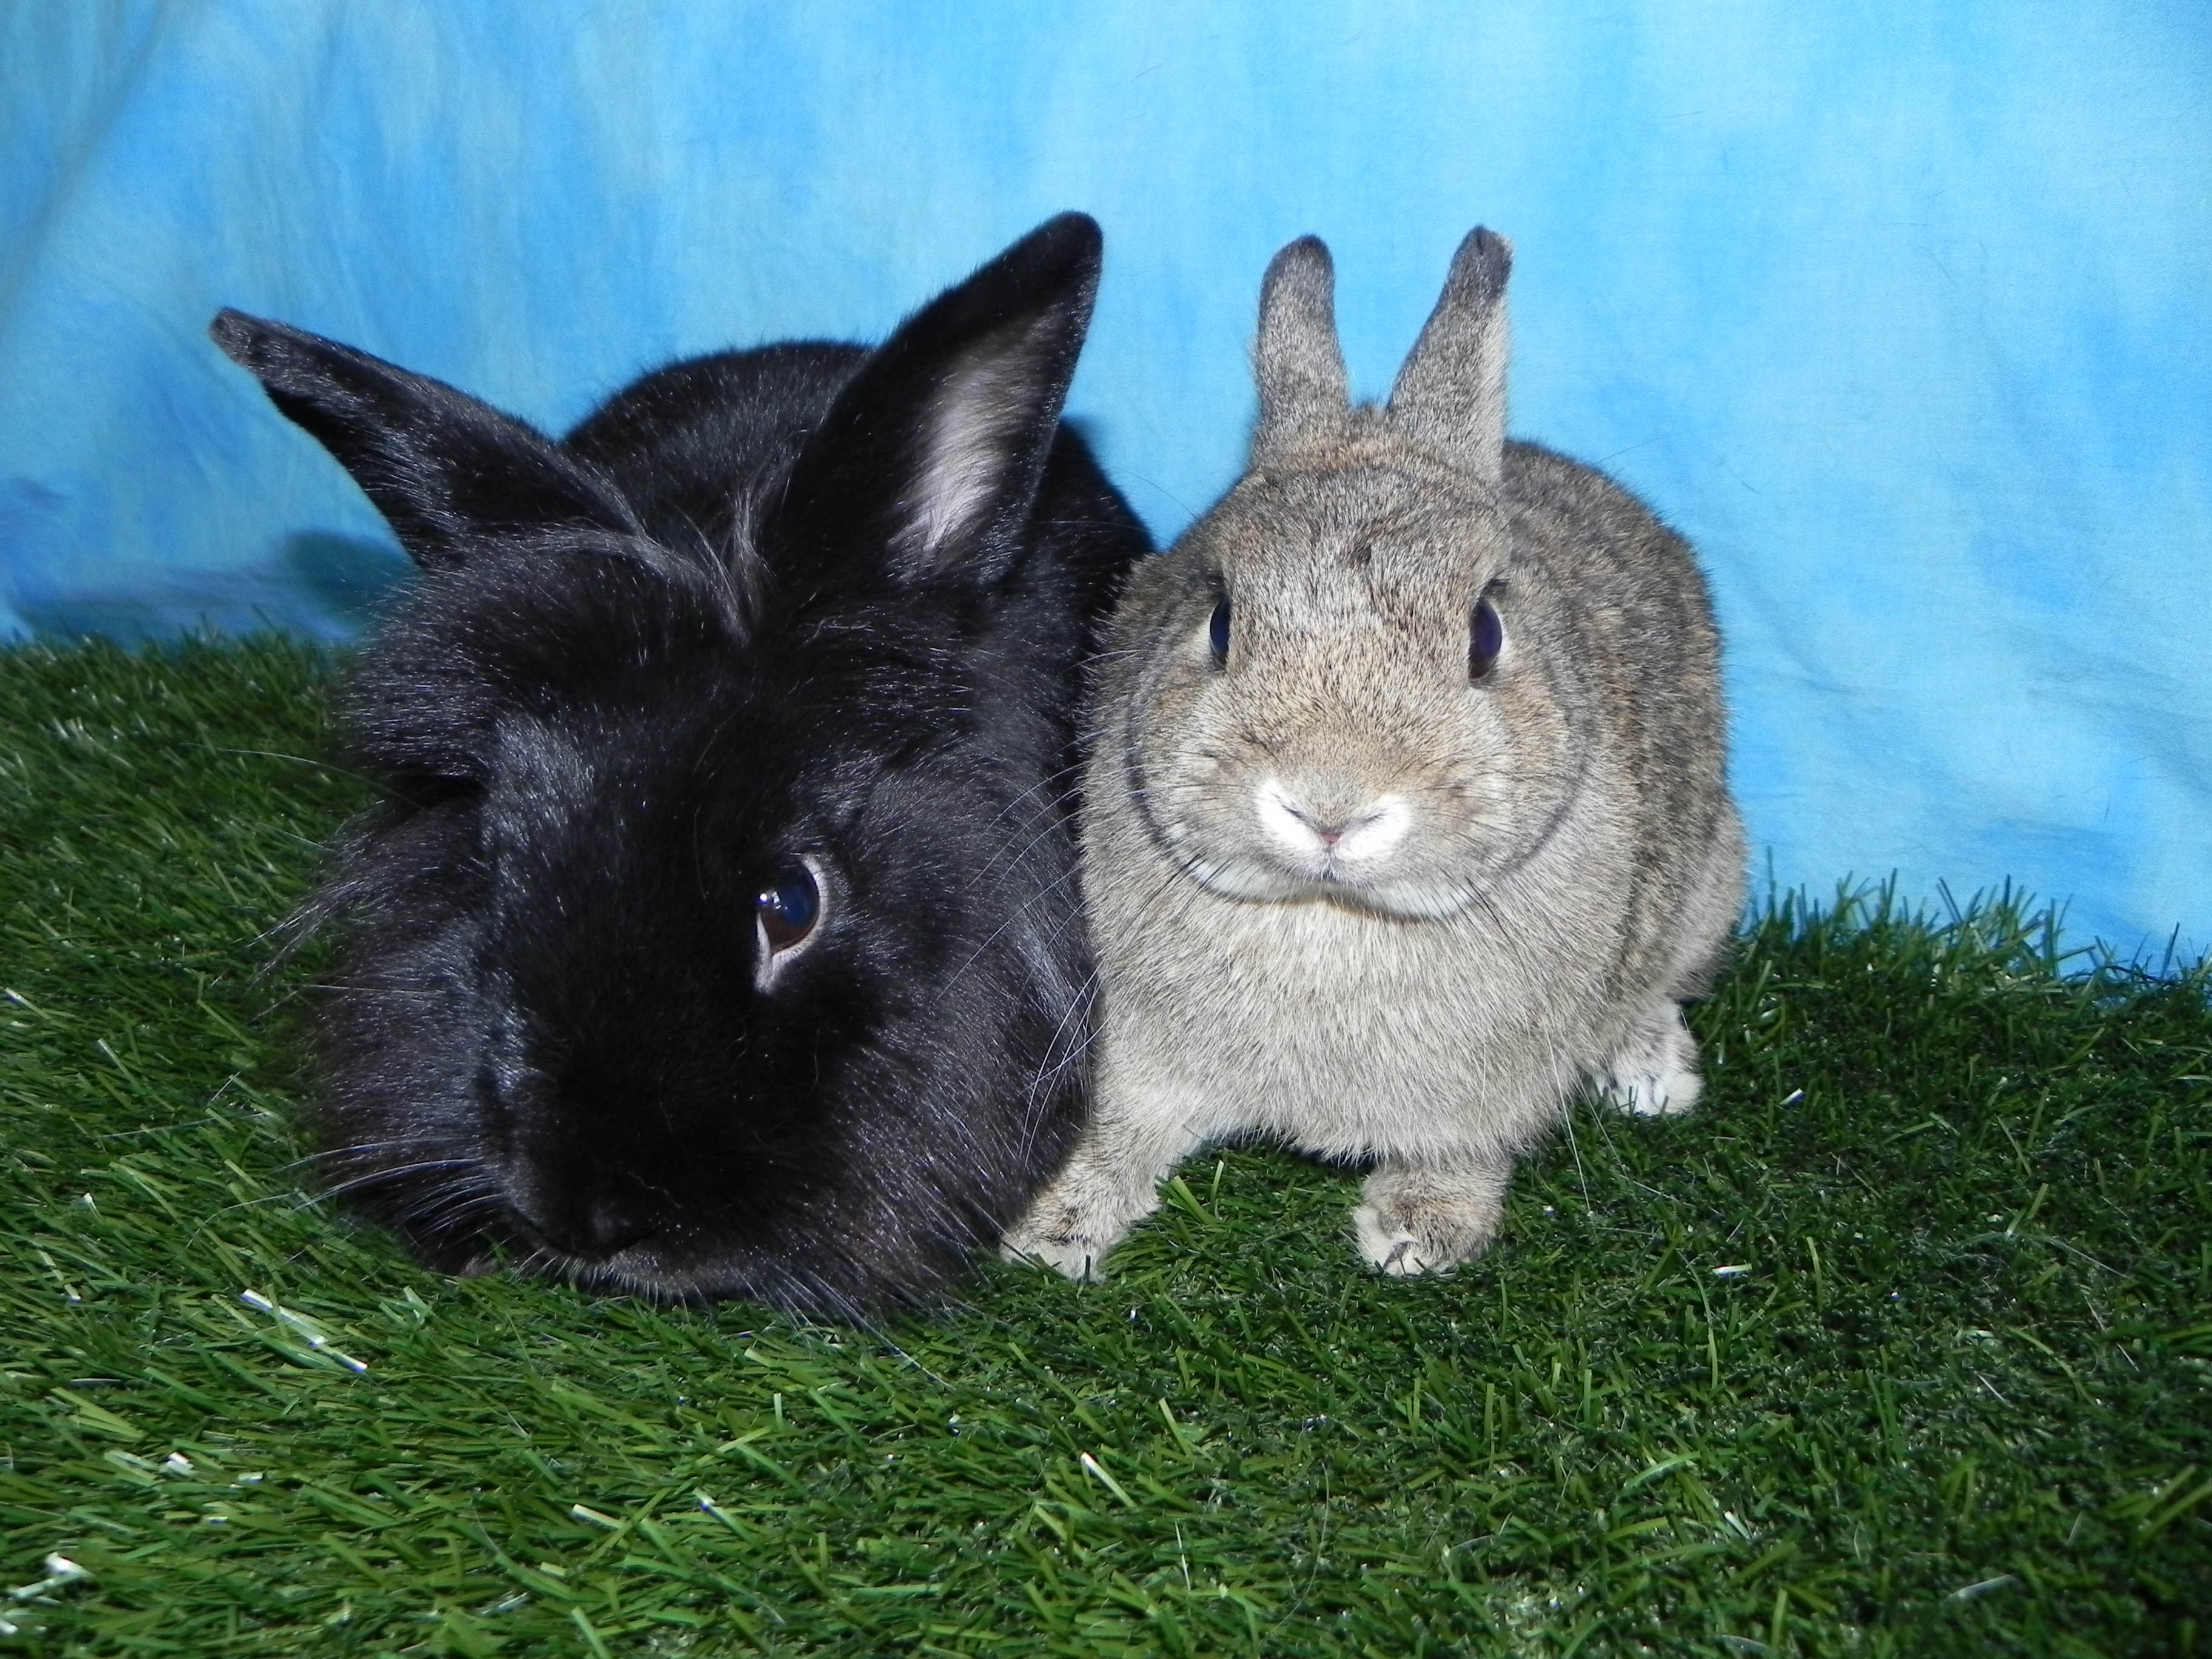 Sharpie and Millie